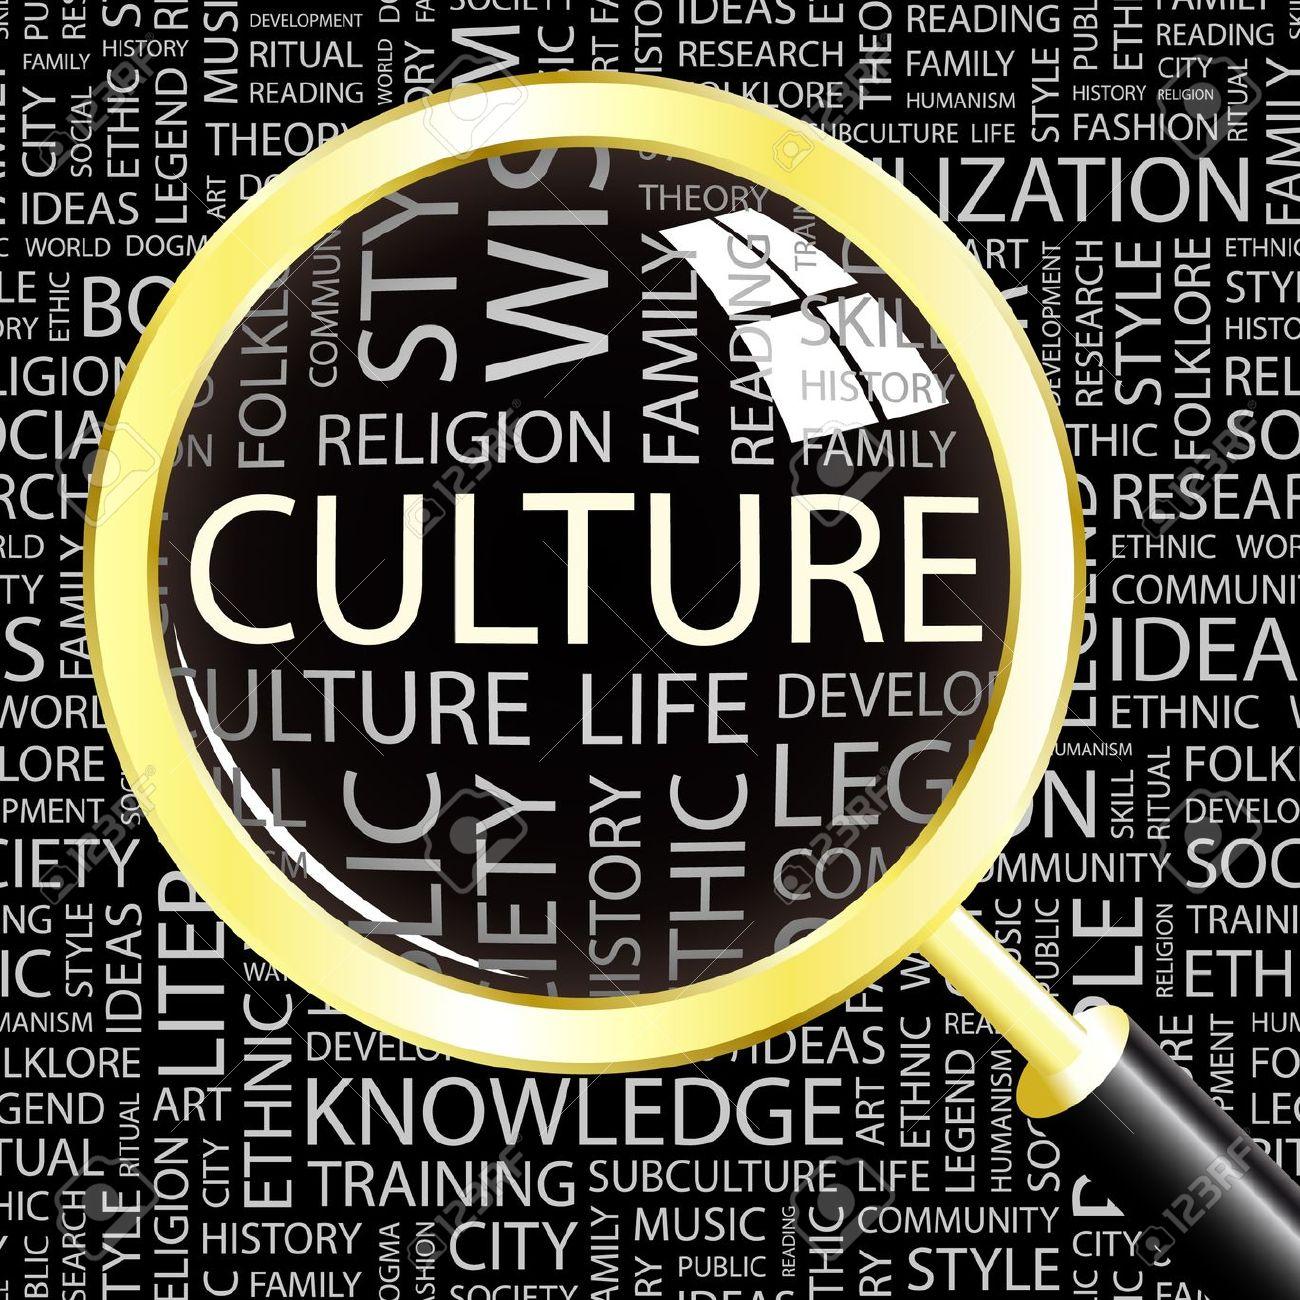 Culture clipart cultural diversity Download Clip Diversity Free clipart